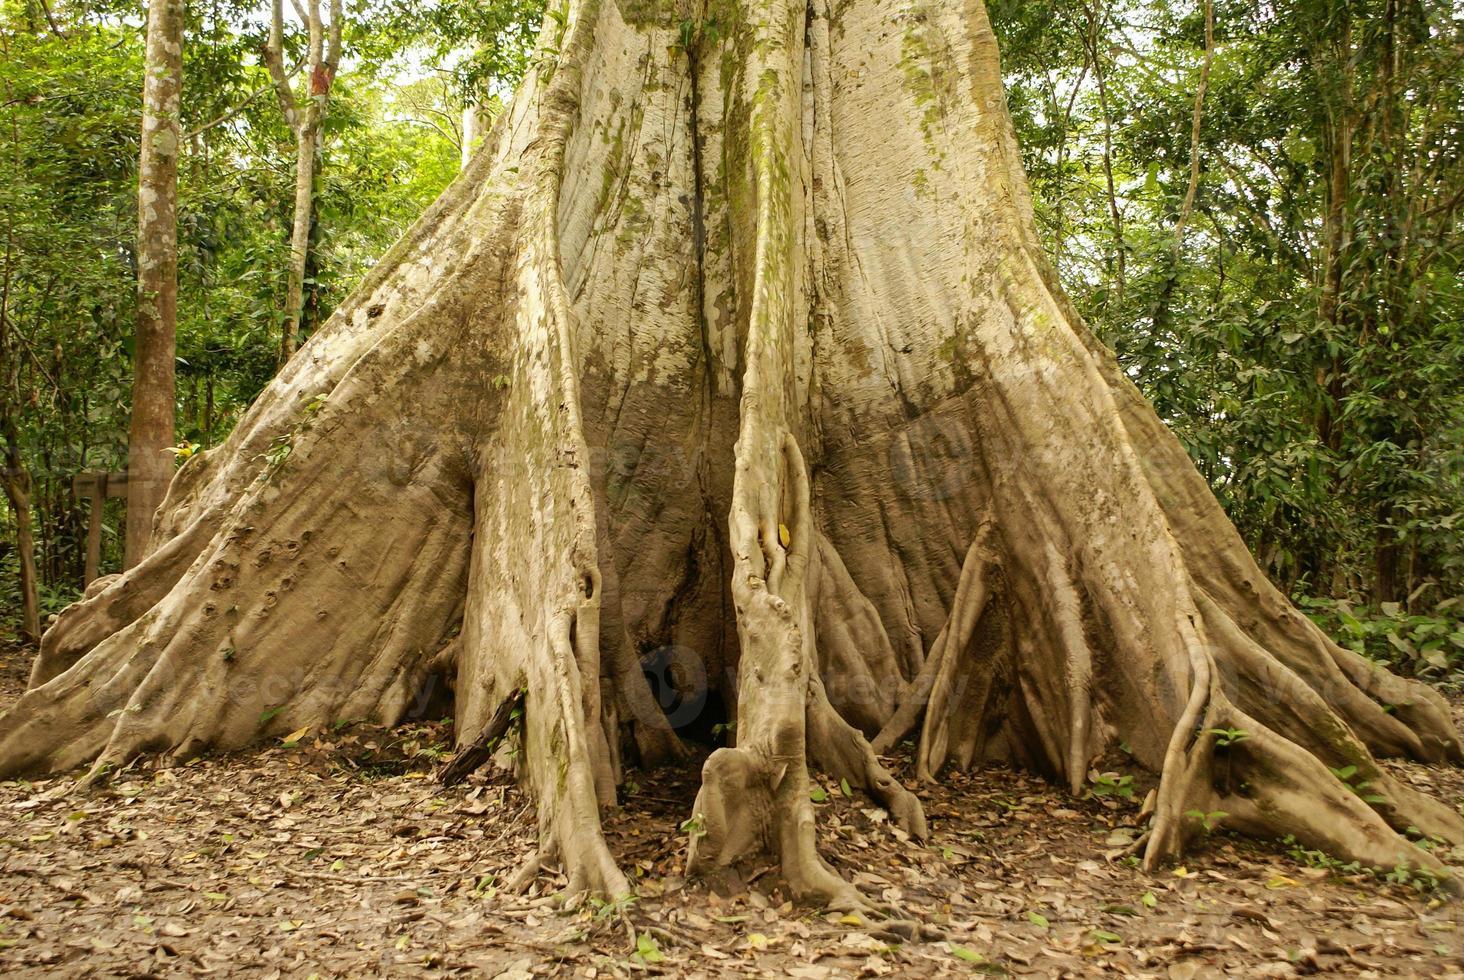 arbre de la jungle amazonienne photo